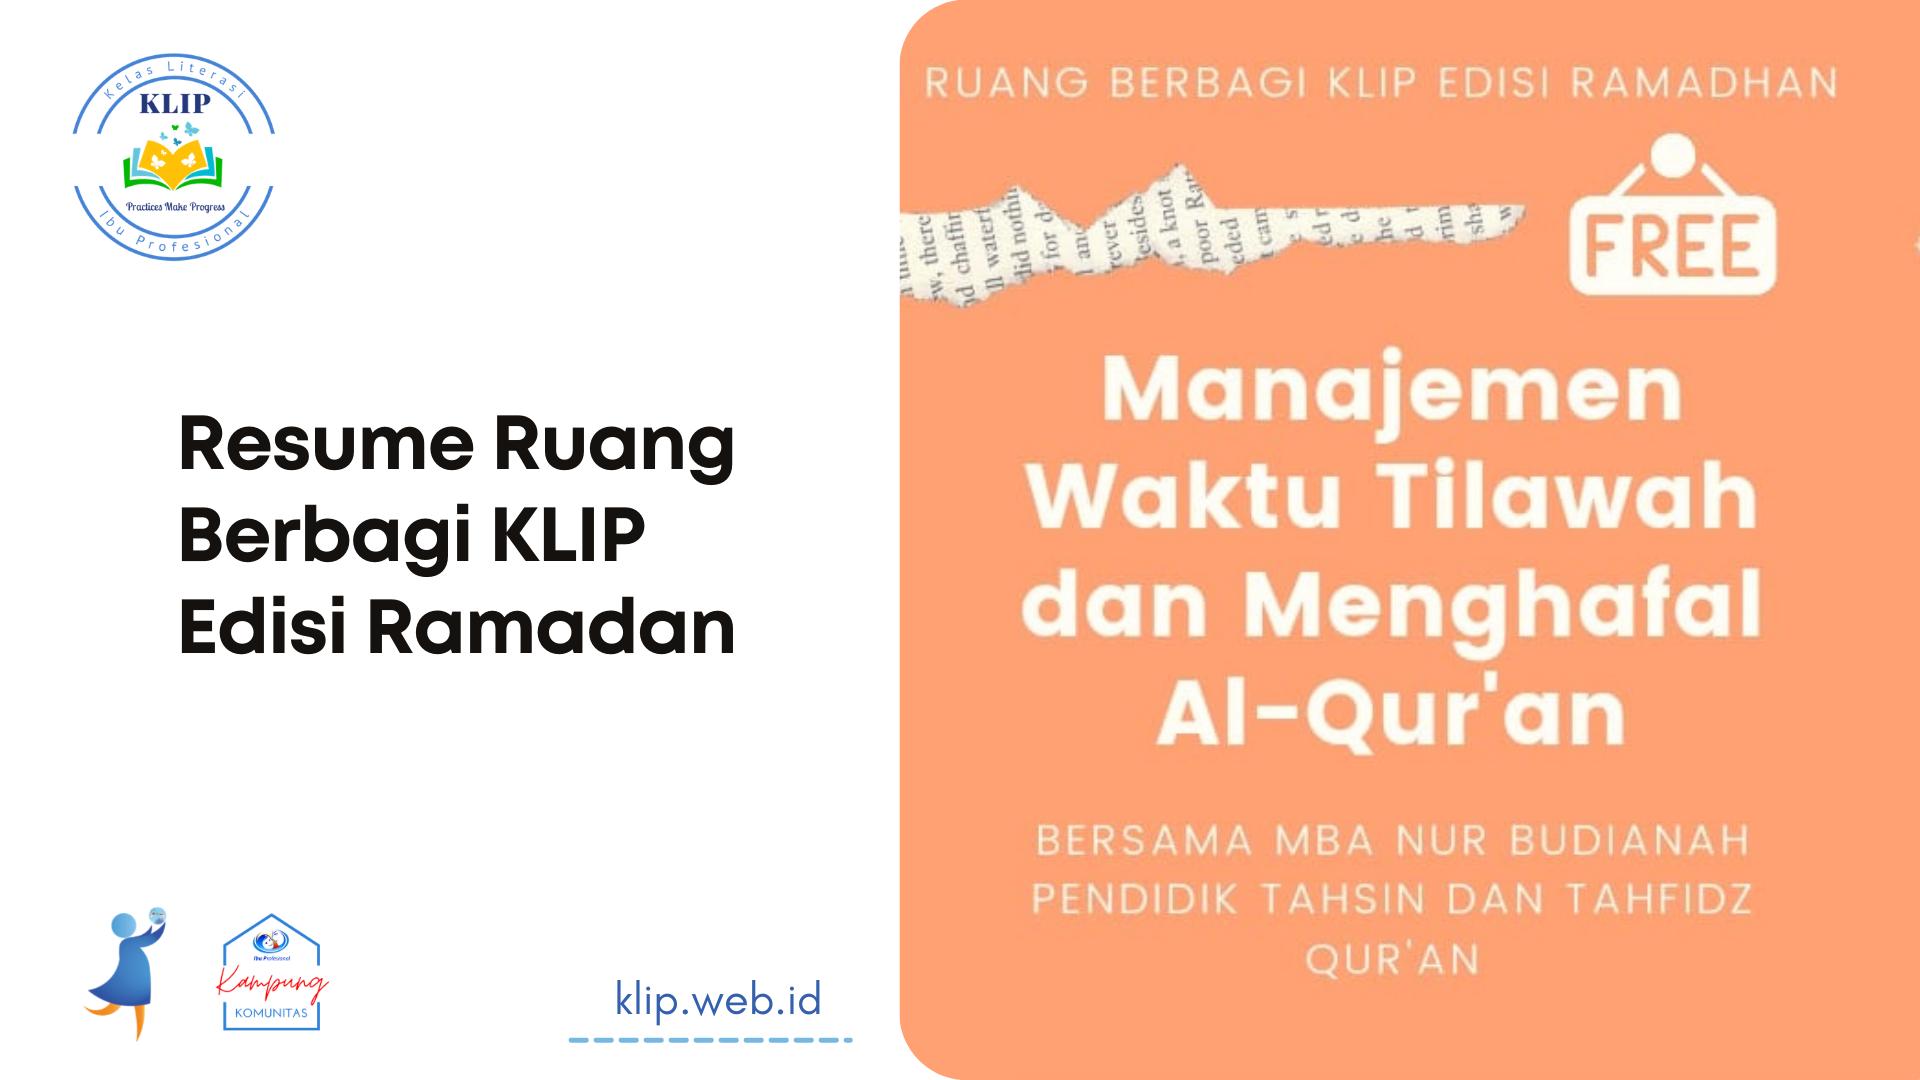 Tips Manajemen Waktu Membaca Dan Menghafal Al-qur'an